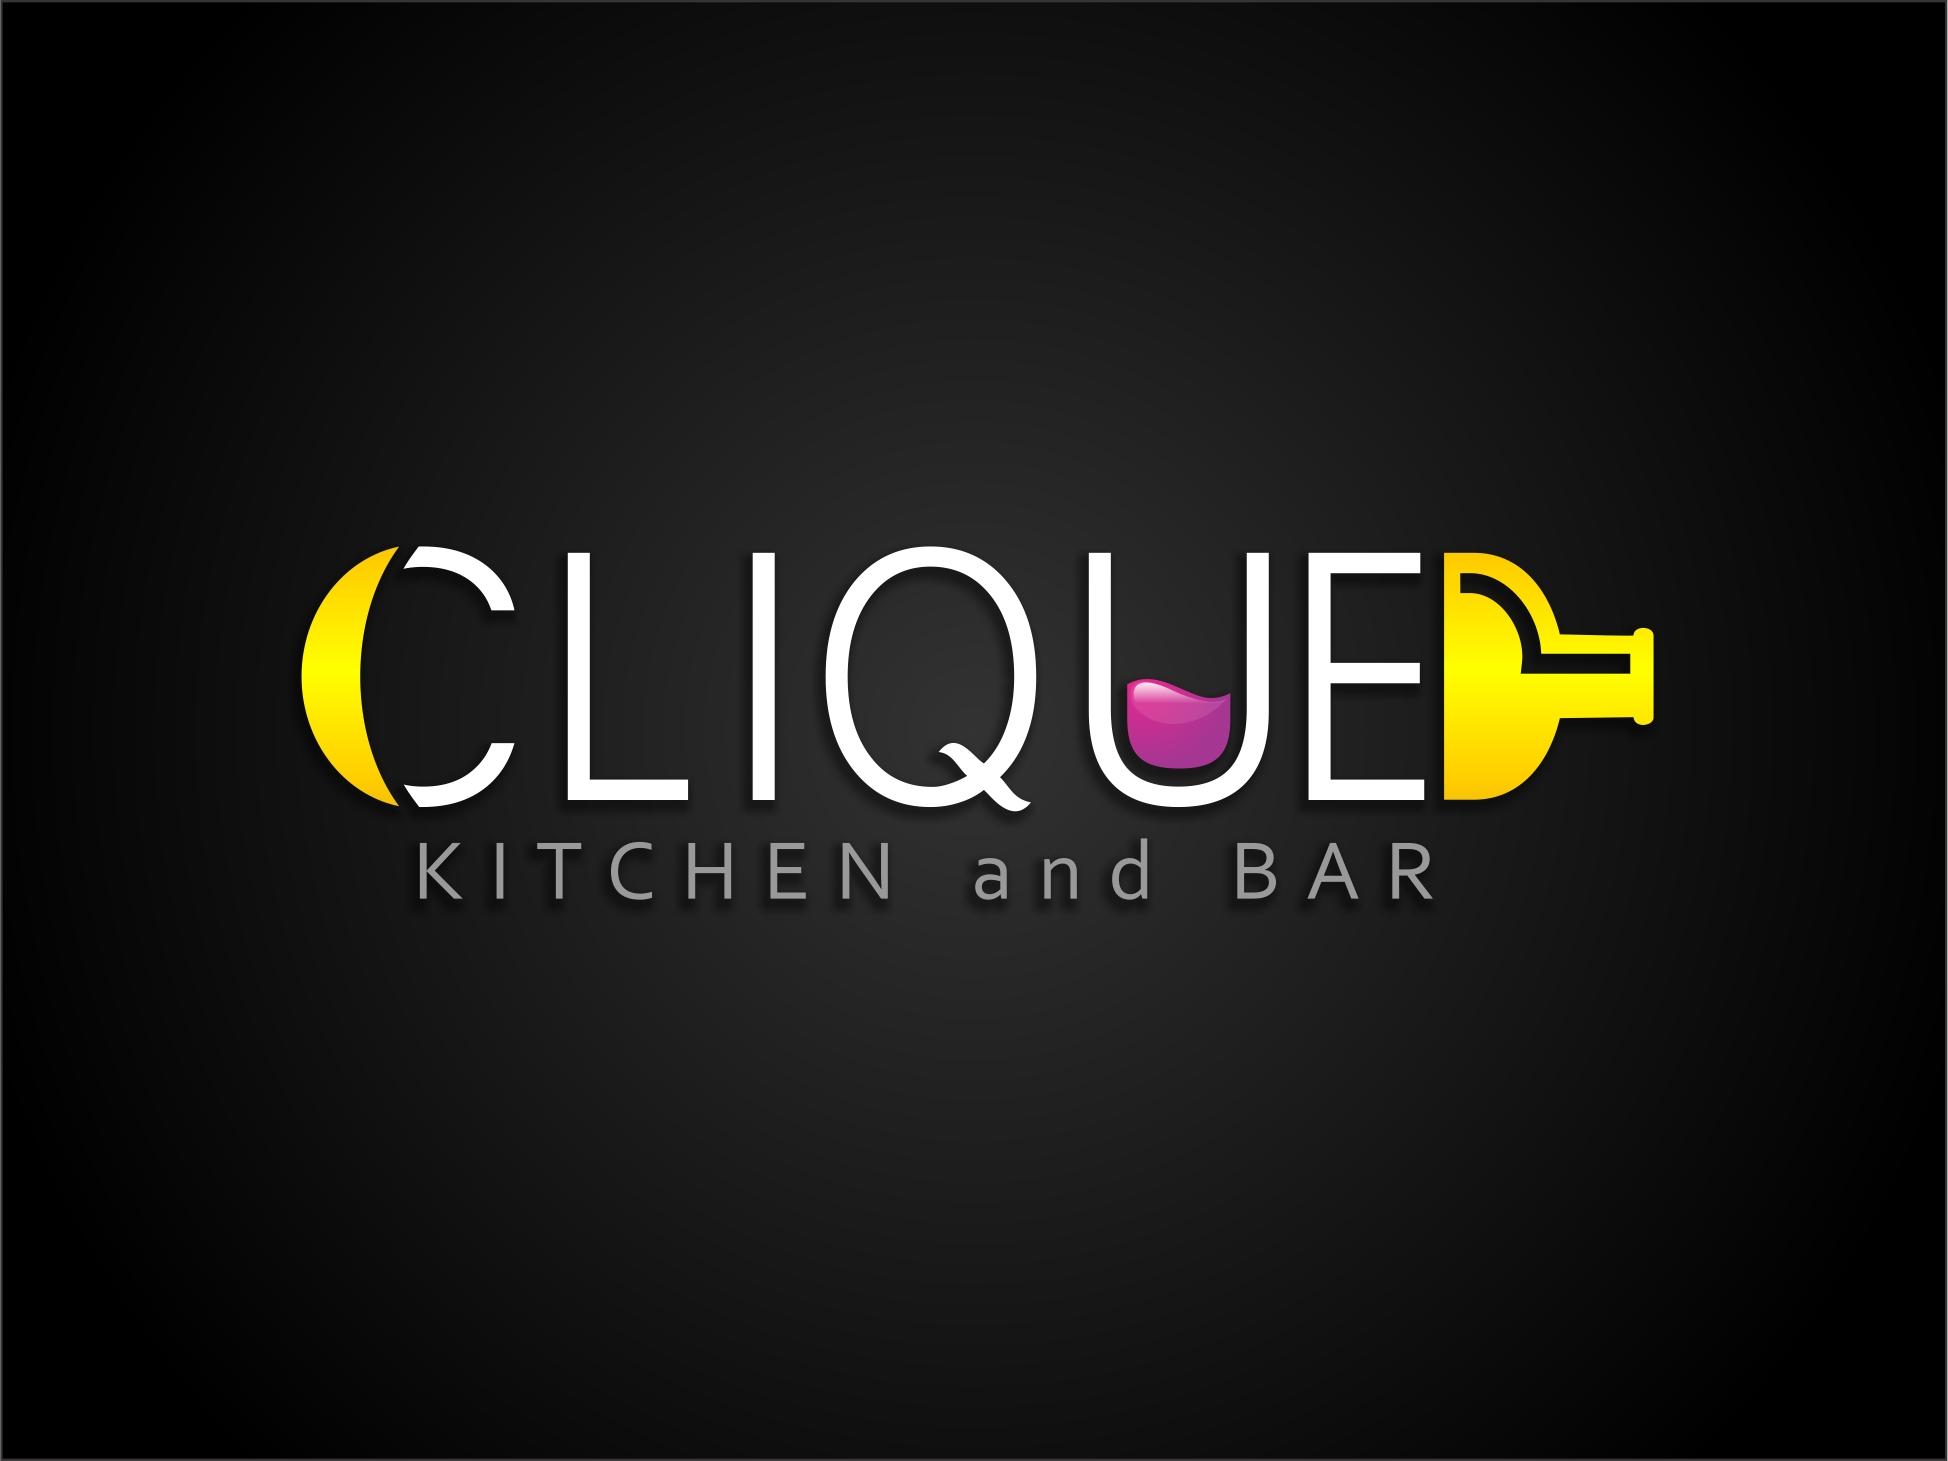 Kitchen and bar logo designs